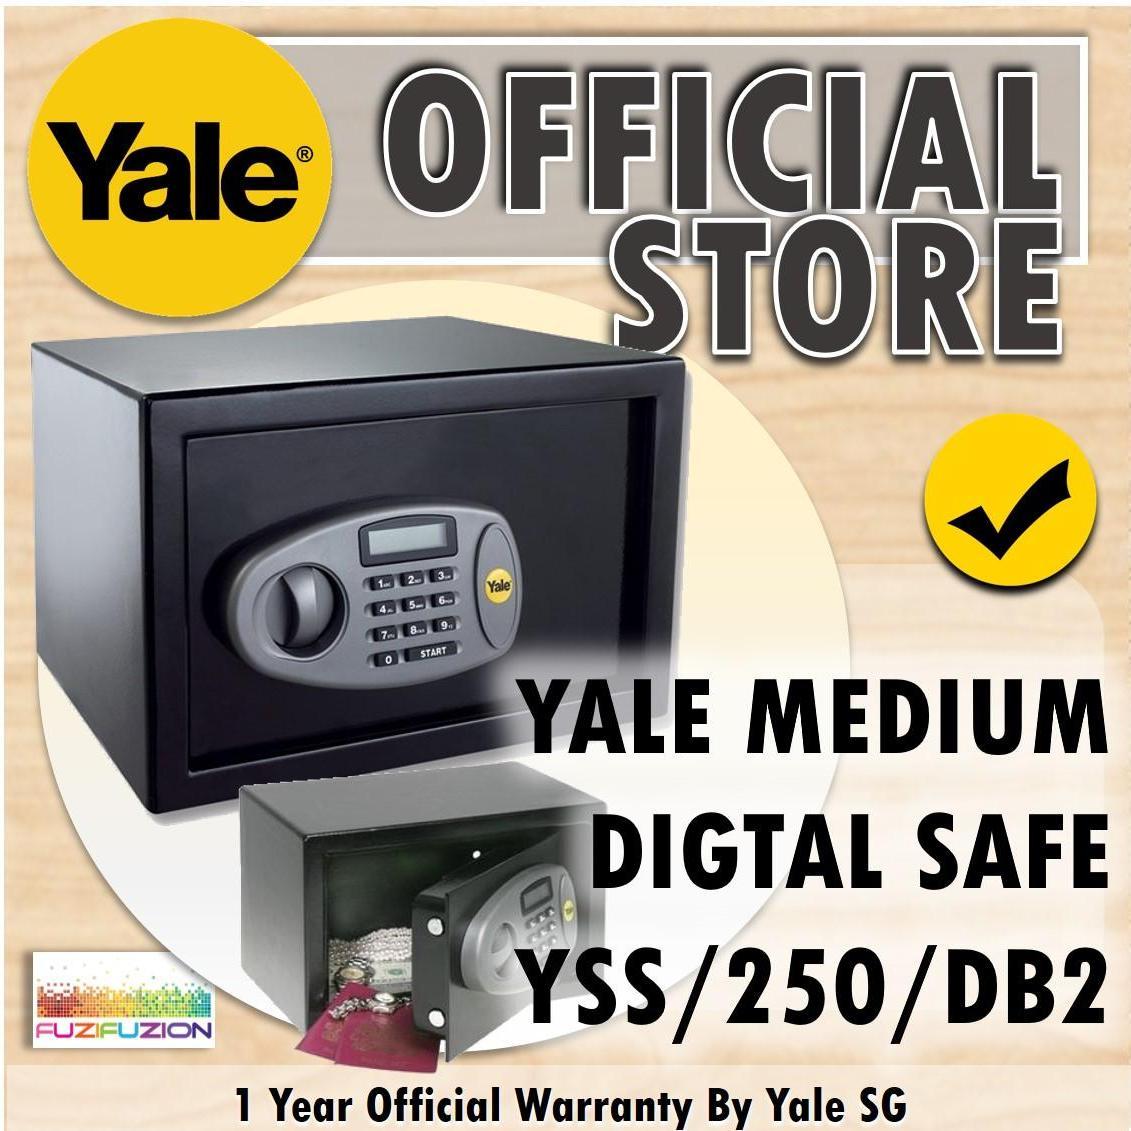 Yale YSS/250/DB2 Medium Standard Safe